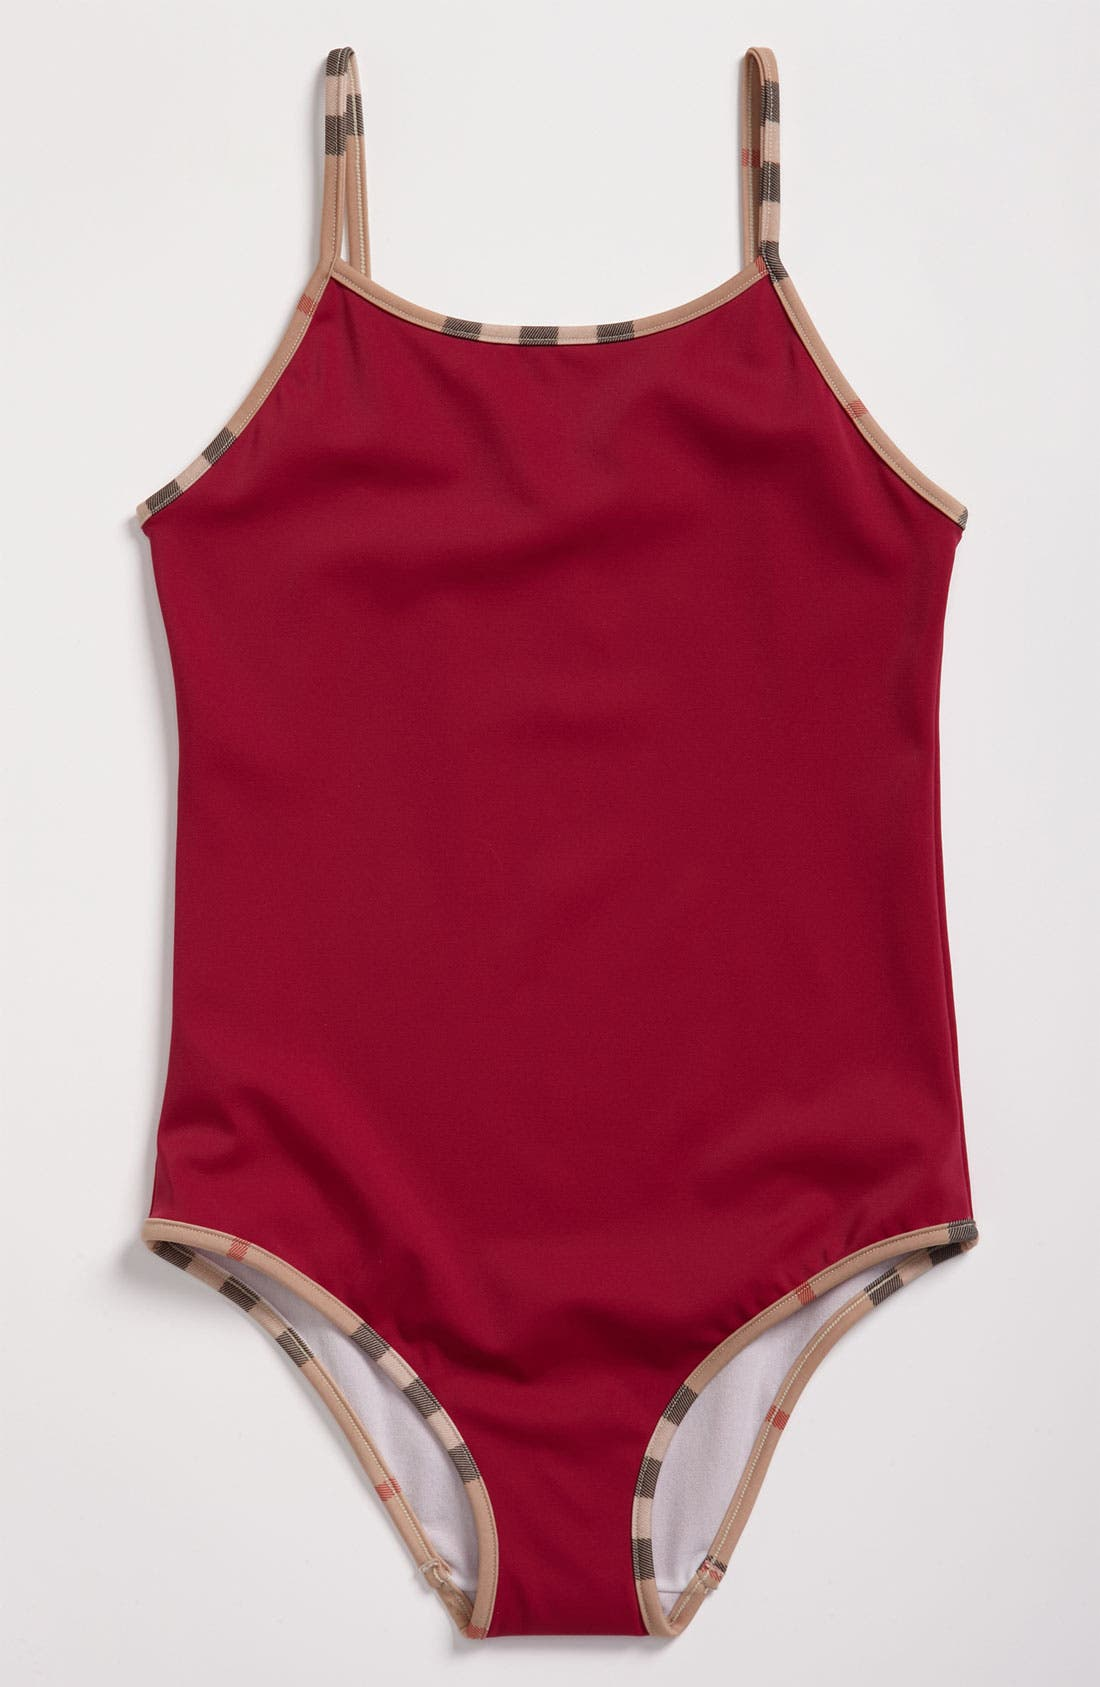 Main Image - Burberry One Piece Swimsuit (Big Girls)